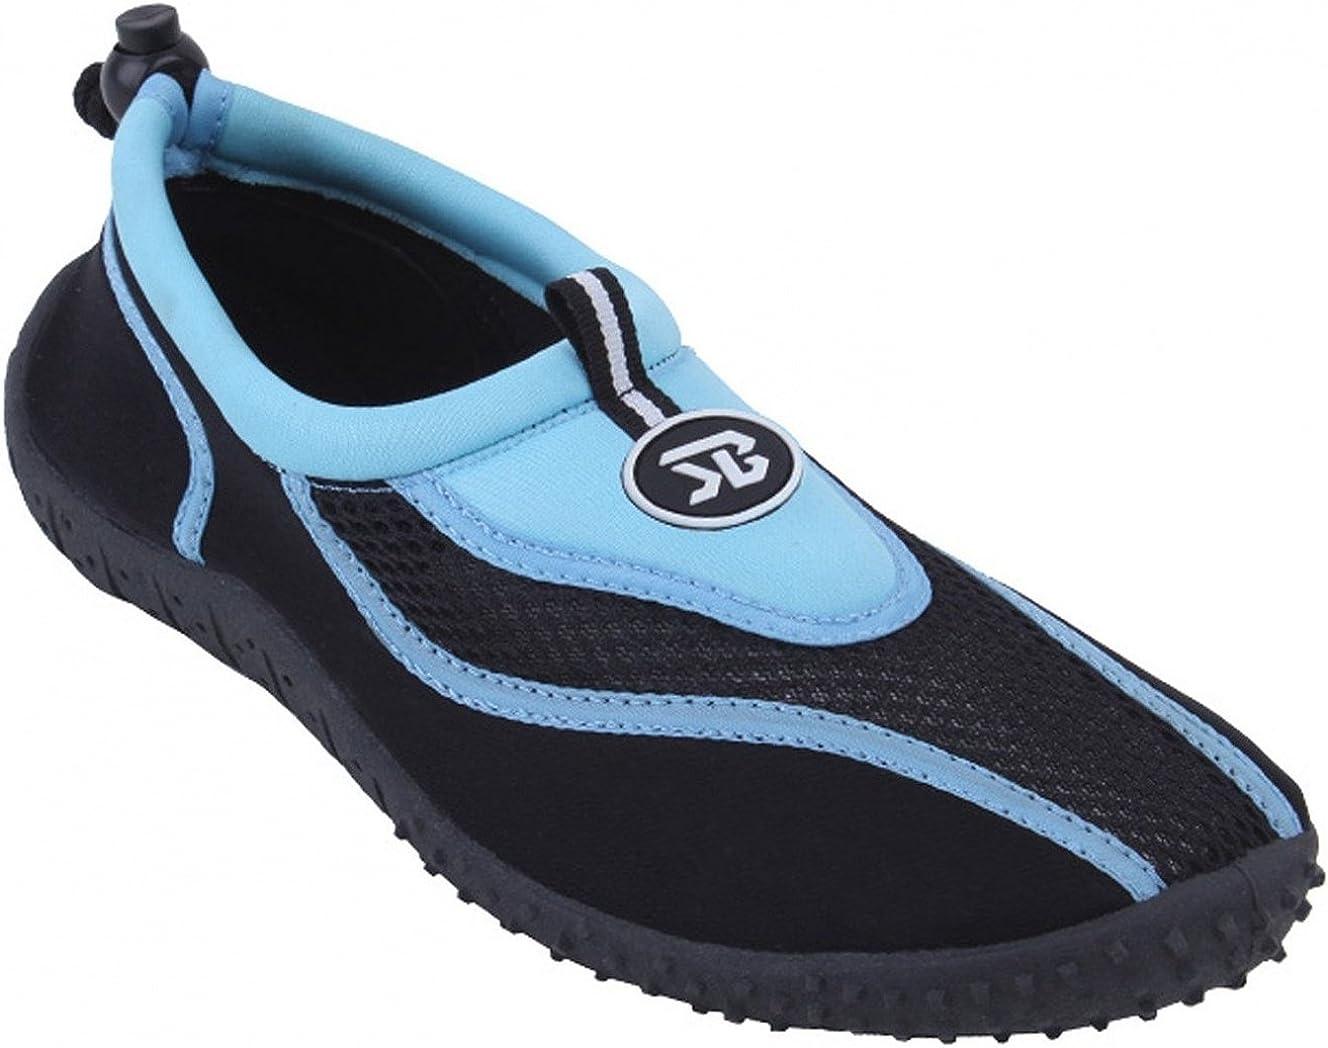 S2907 Women's 4 Colors Water Shoes Aqua Socks Slip on Athletic P